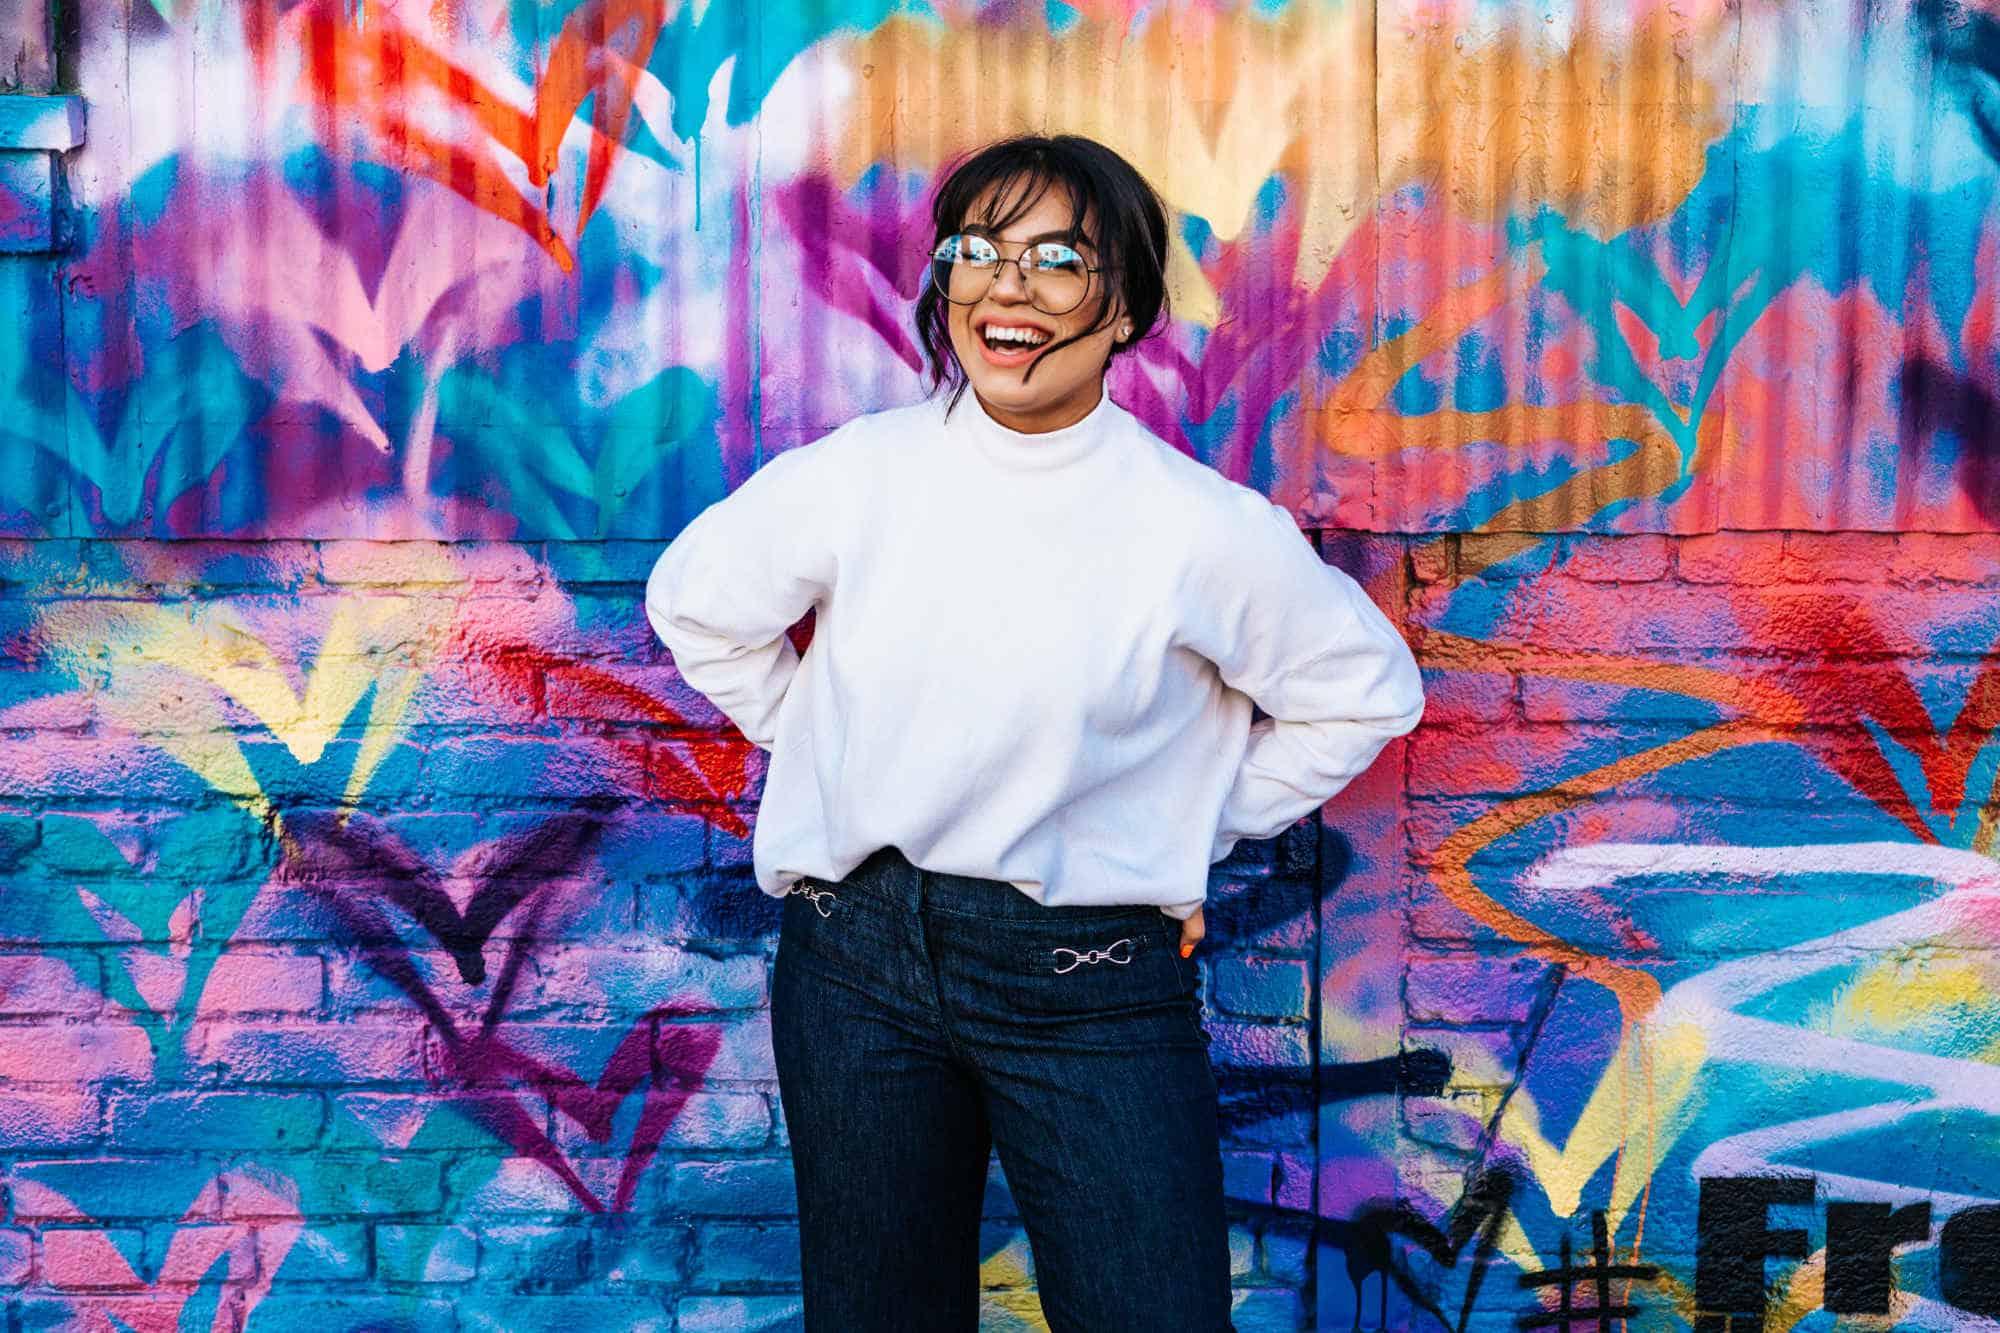 Lachende junge Frau vor Graffiti Wand